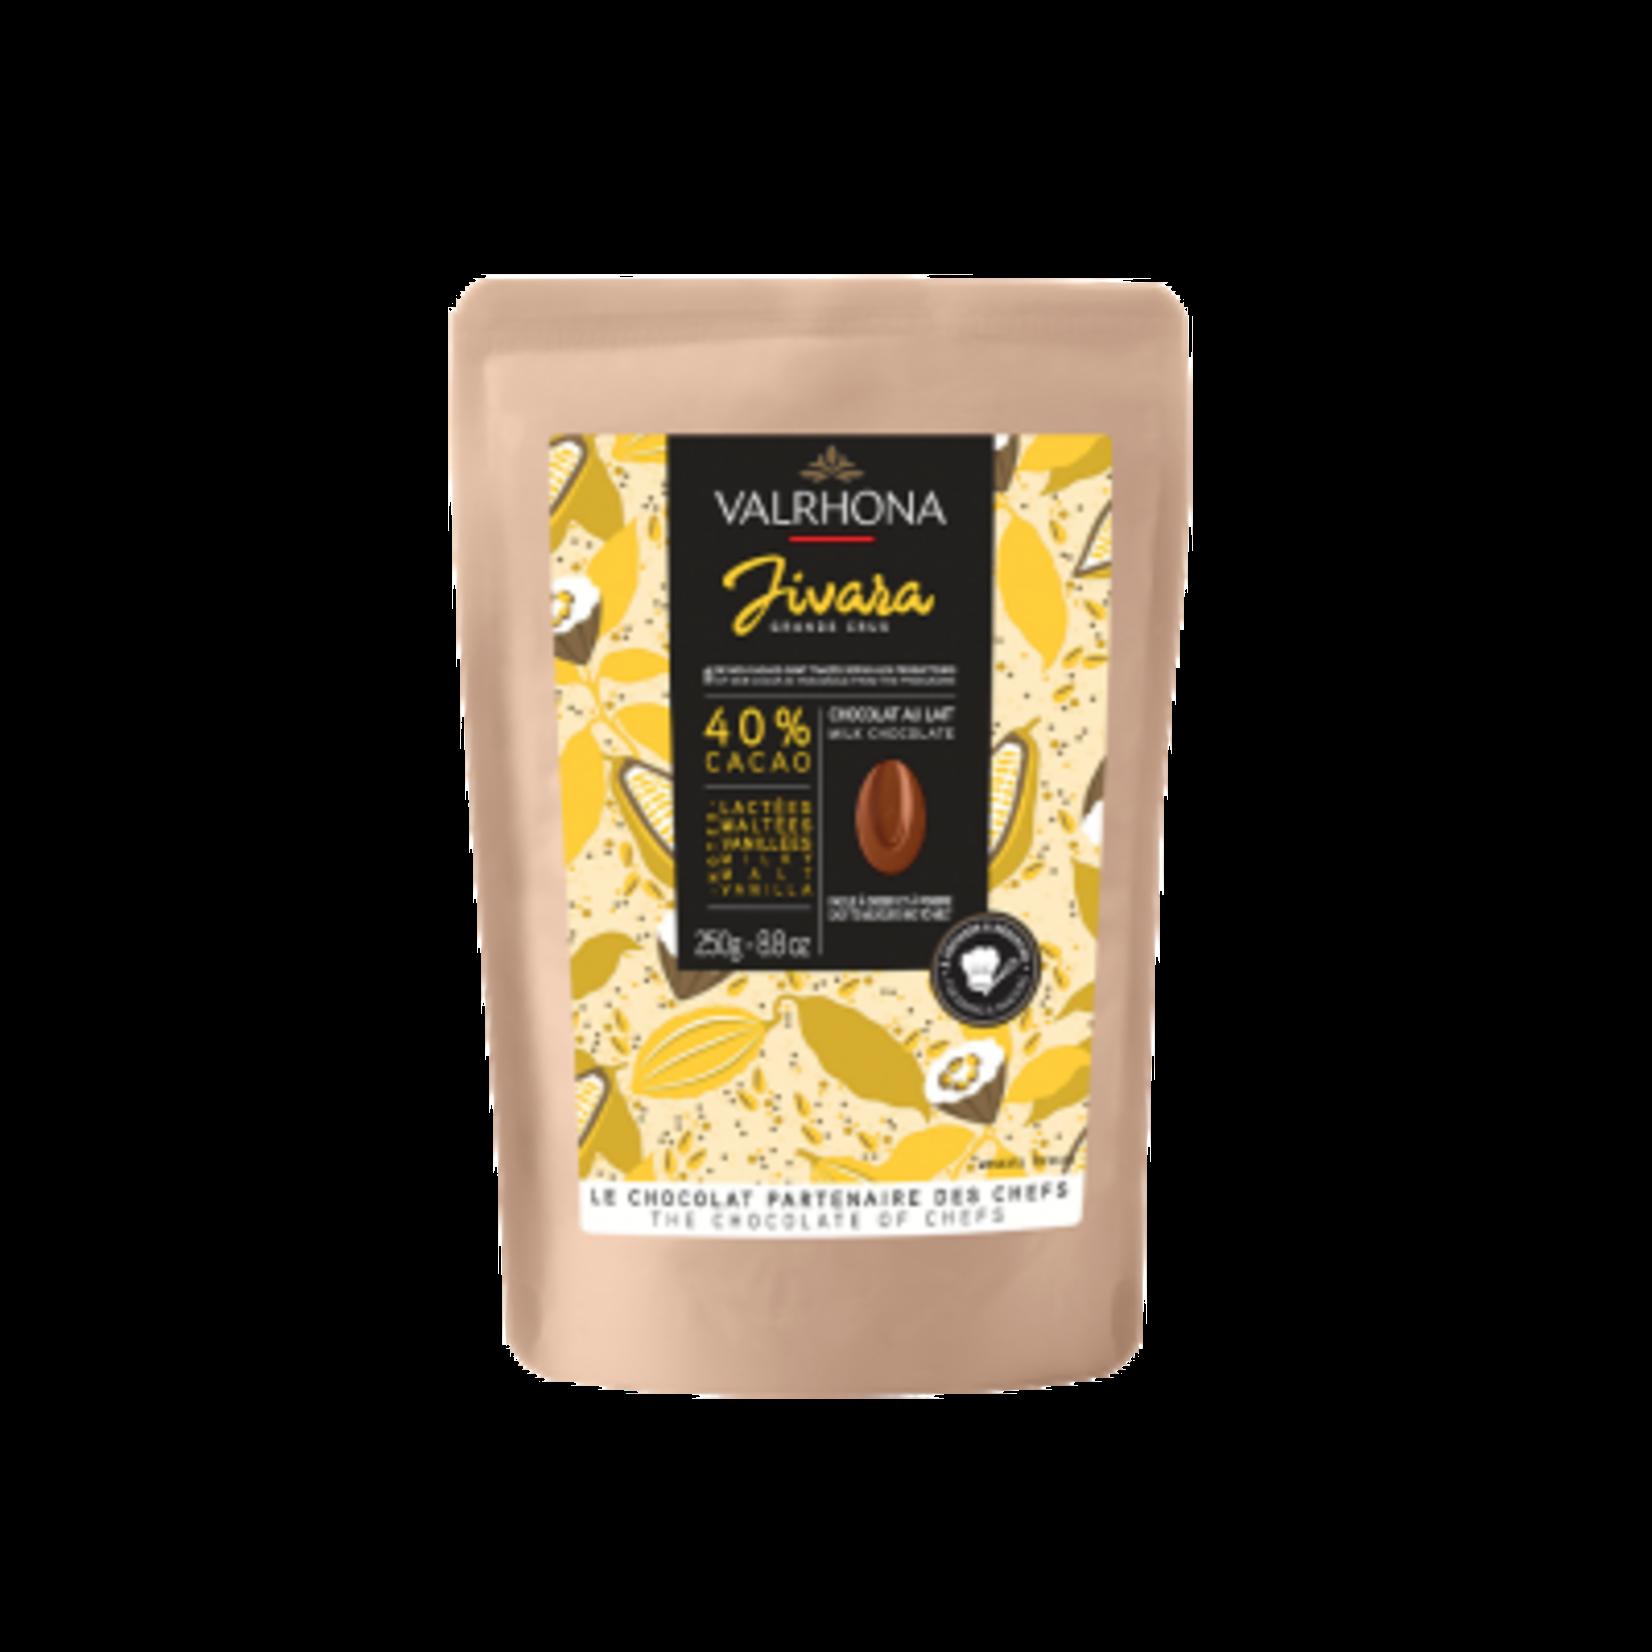 Valrhona Valrhona - Jivara Milk Chocolate 40% - 250g/8.8oz, 31211